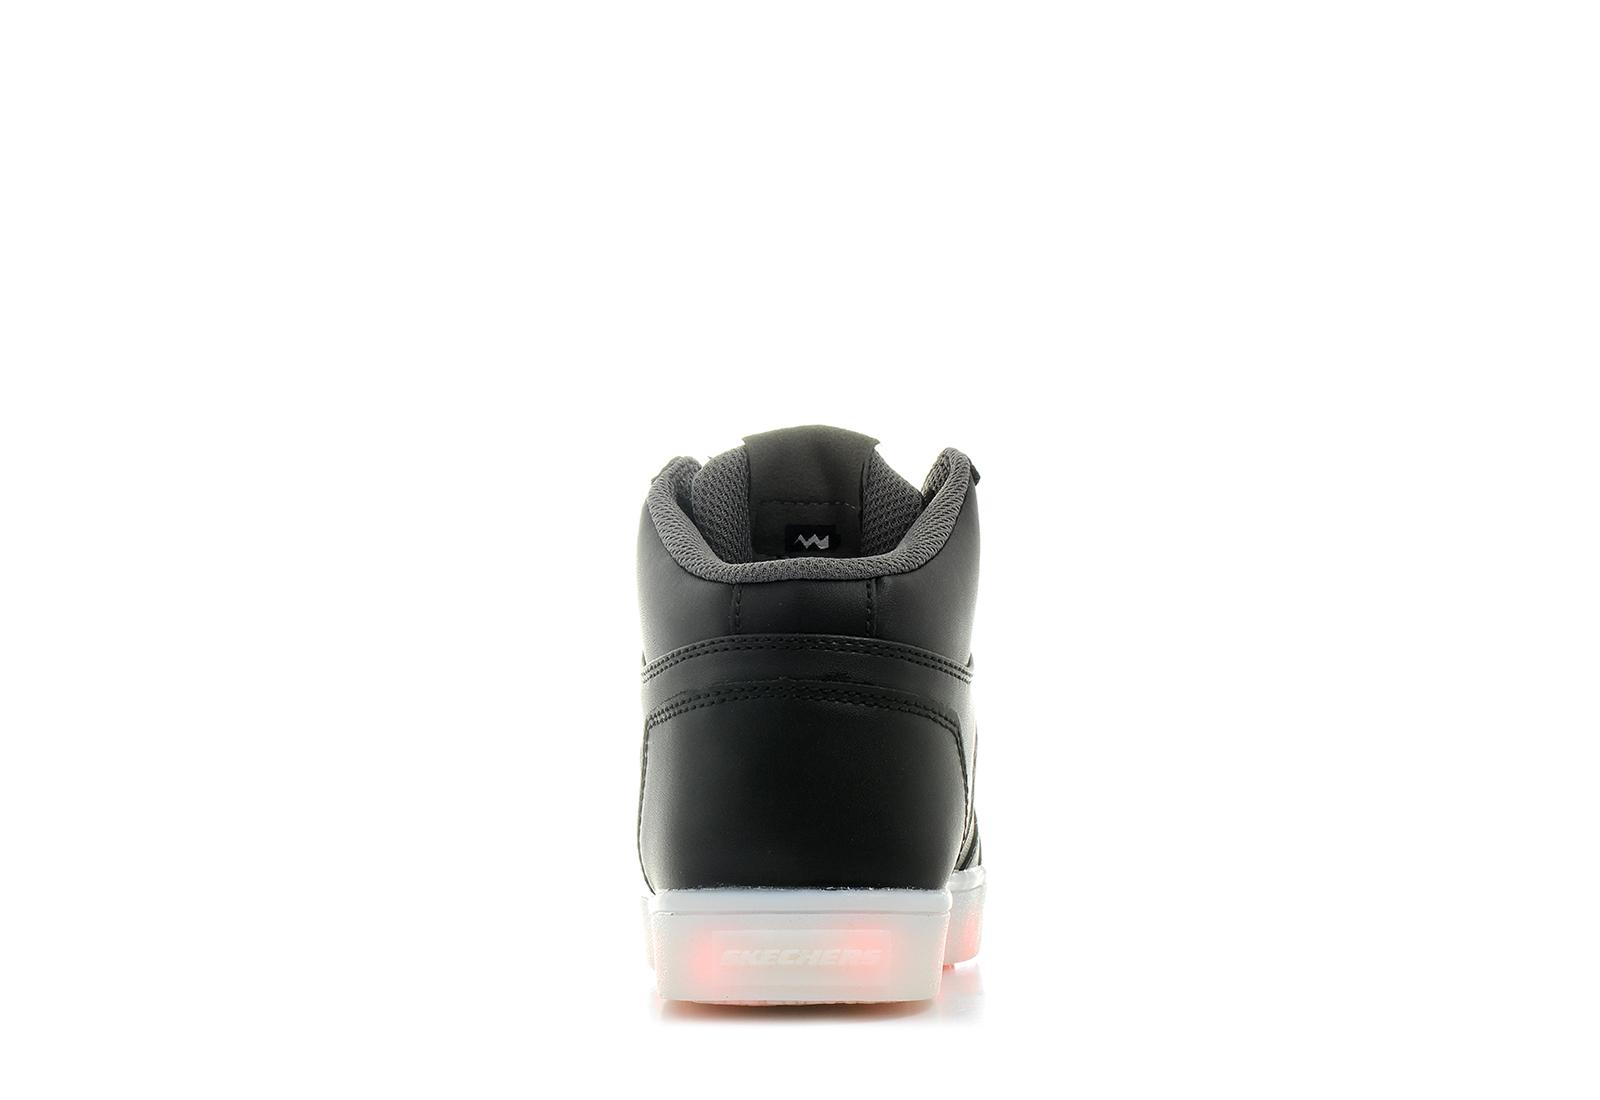 35ec993c22c5 Skechers Topánky - Energy Lights - 90600l-blk - Tenisky